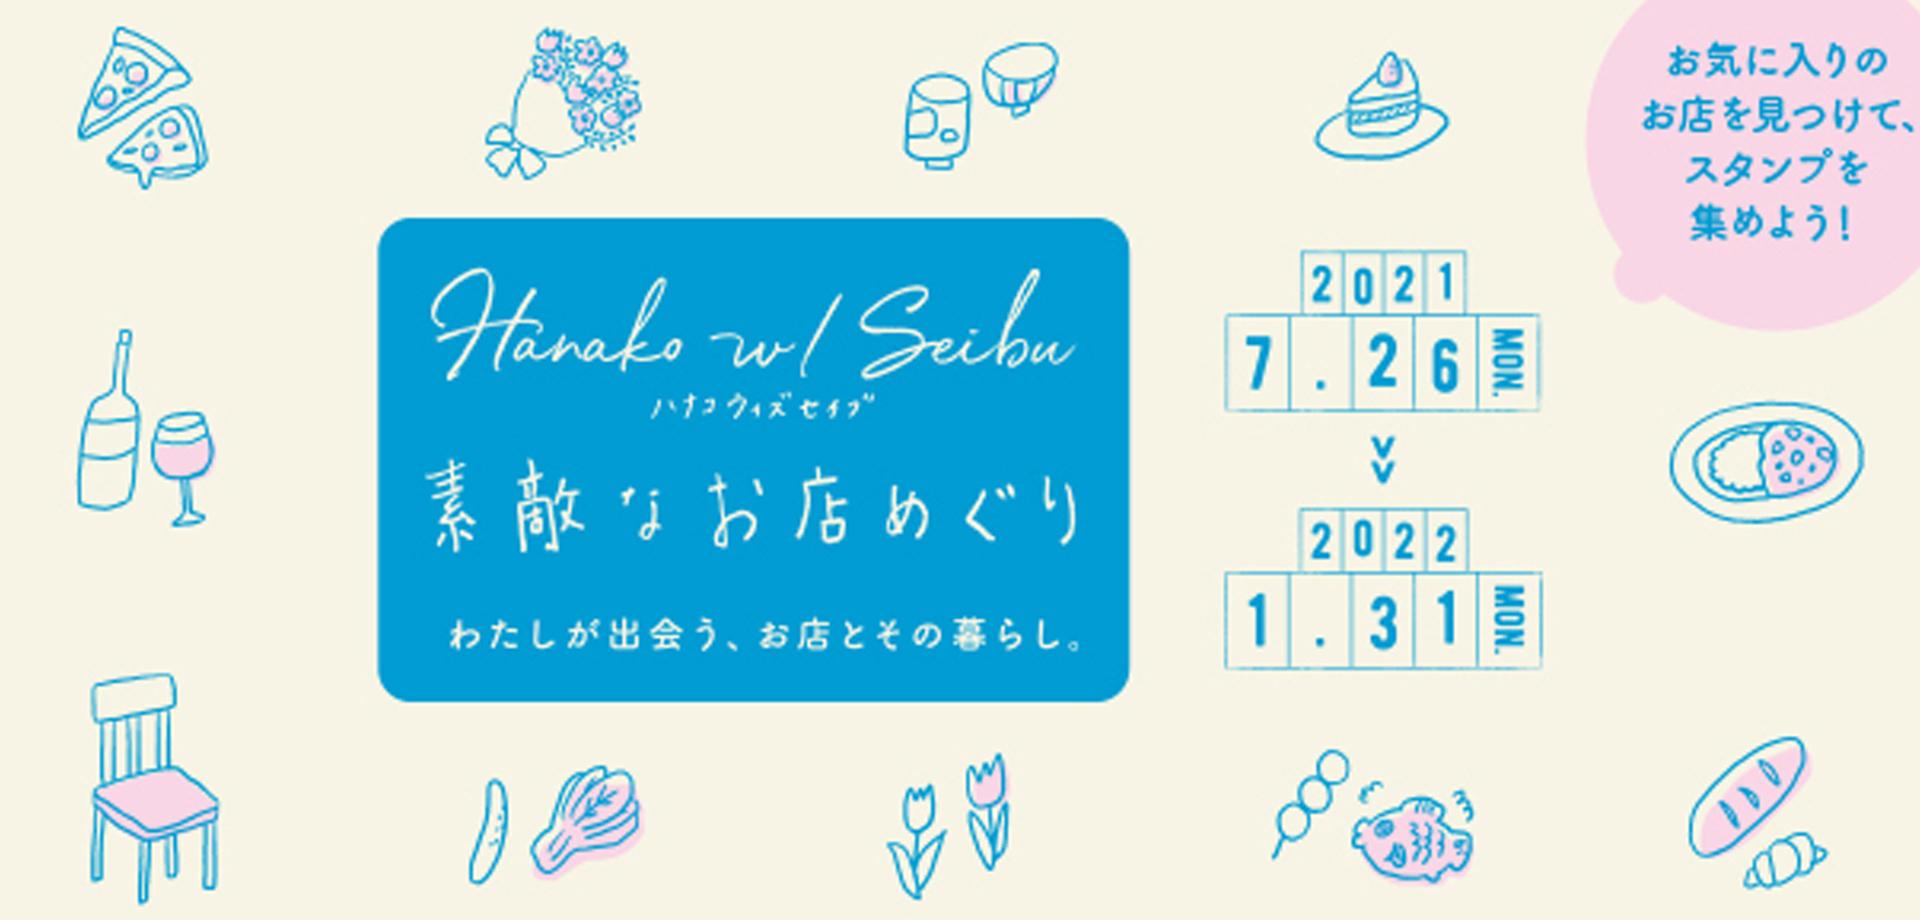 Hanako w/ Seibu初のスタンプラリー開催!「素敵なお店めぐり ーわたしが出会う、お店とその暮らし。 ー」